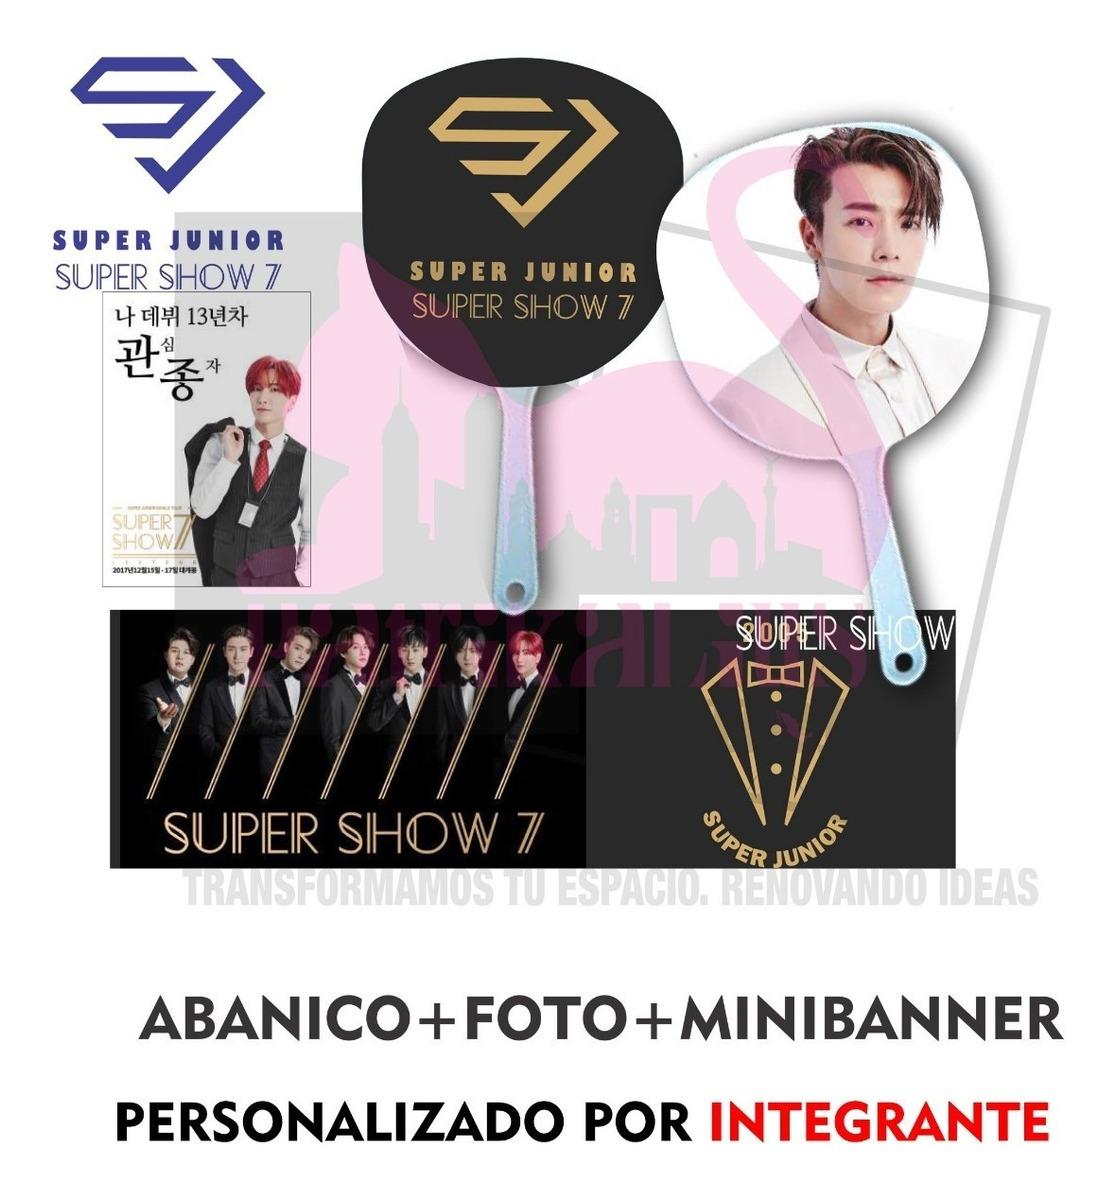 Super Junior Super Show 7 Abanico+foto+banner